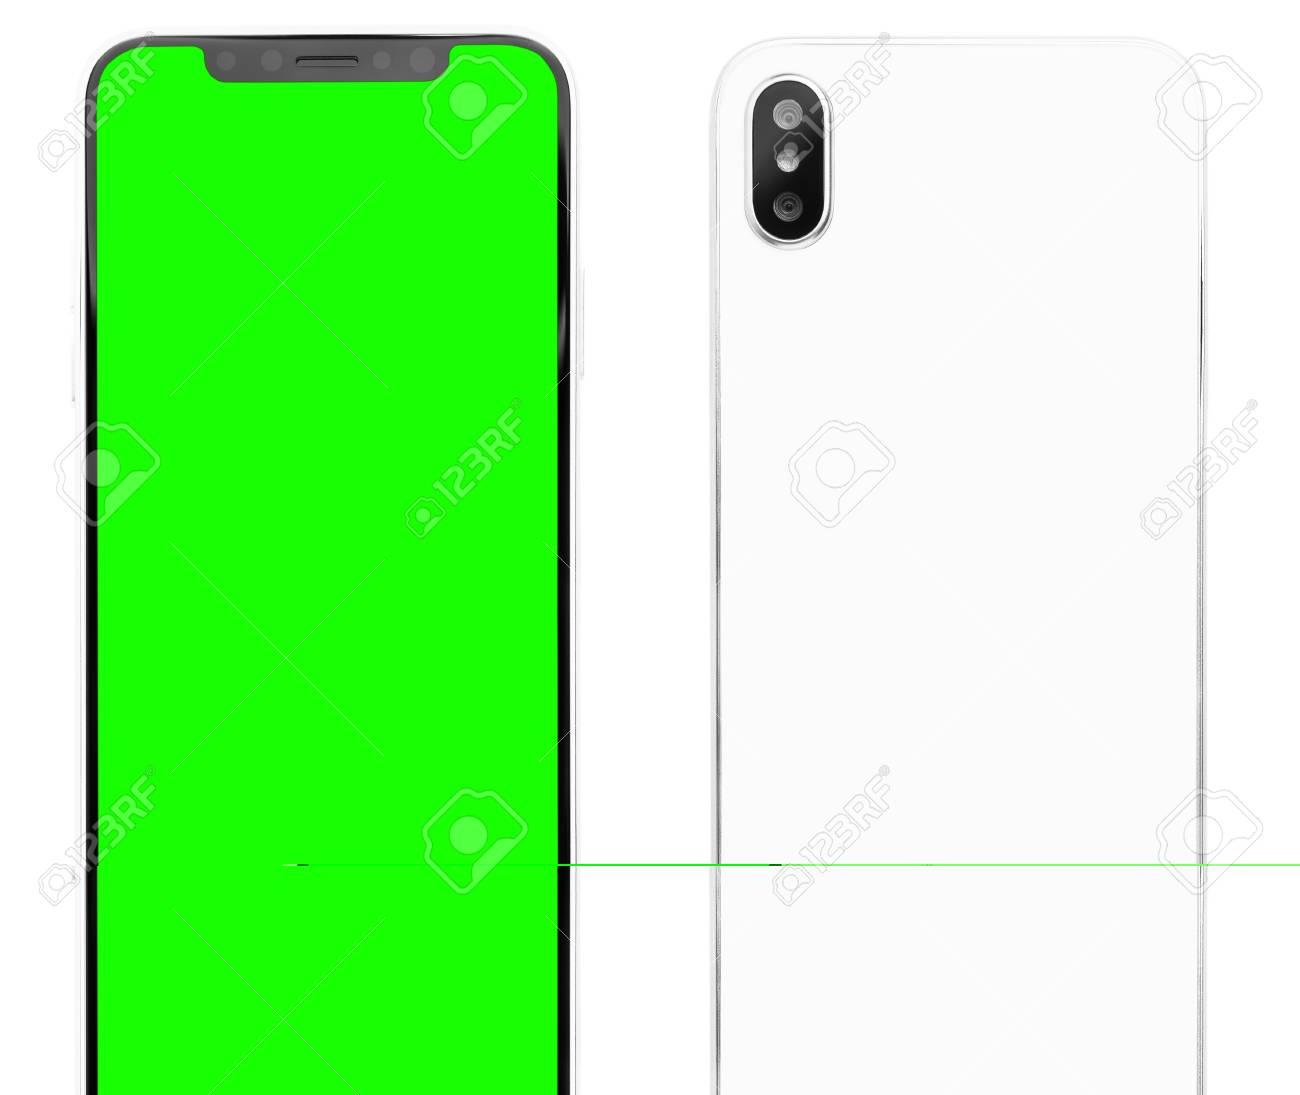 Modern smart phone model looks similar to Iphone X model Green